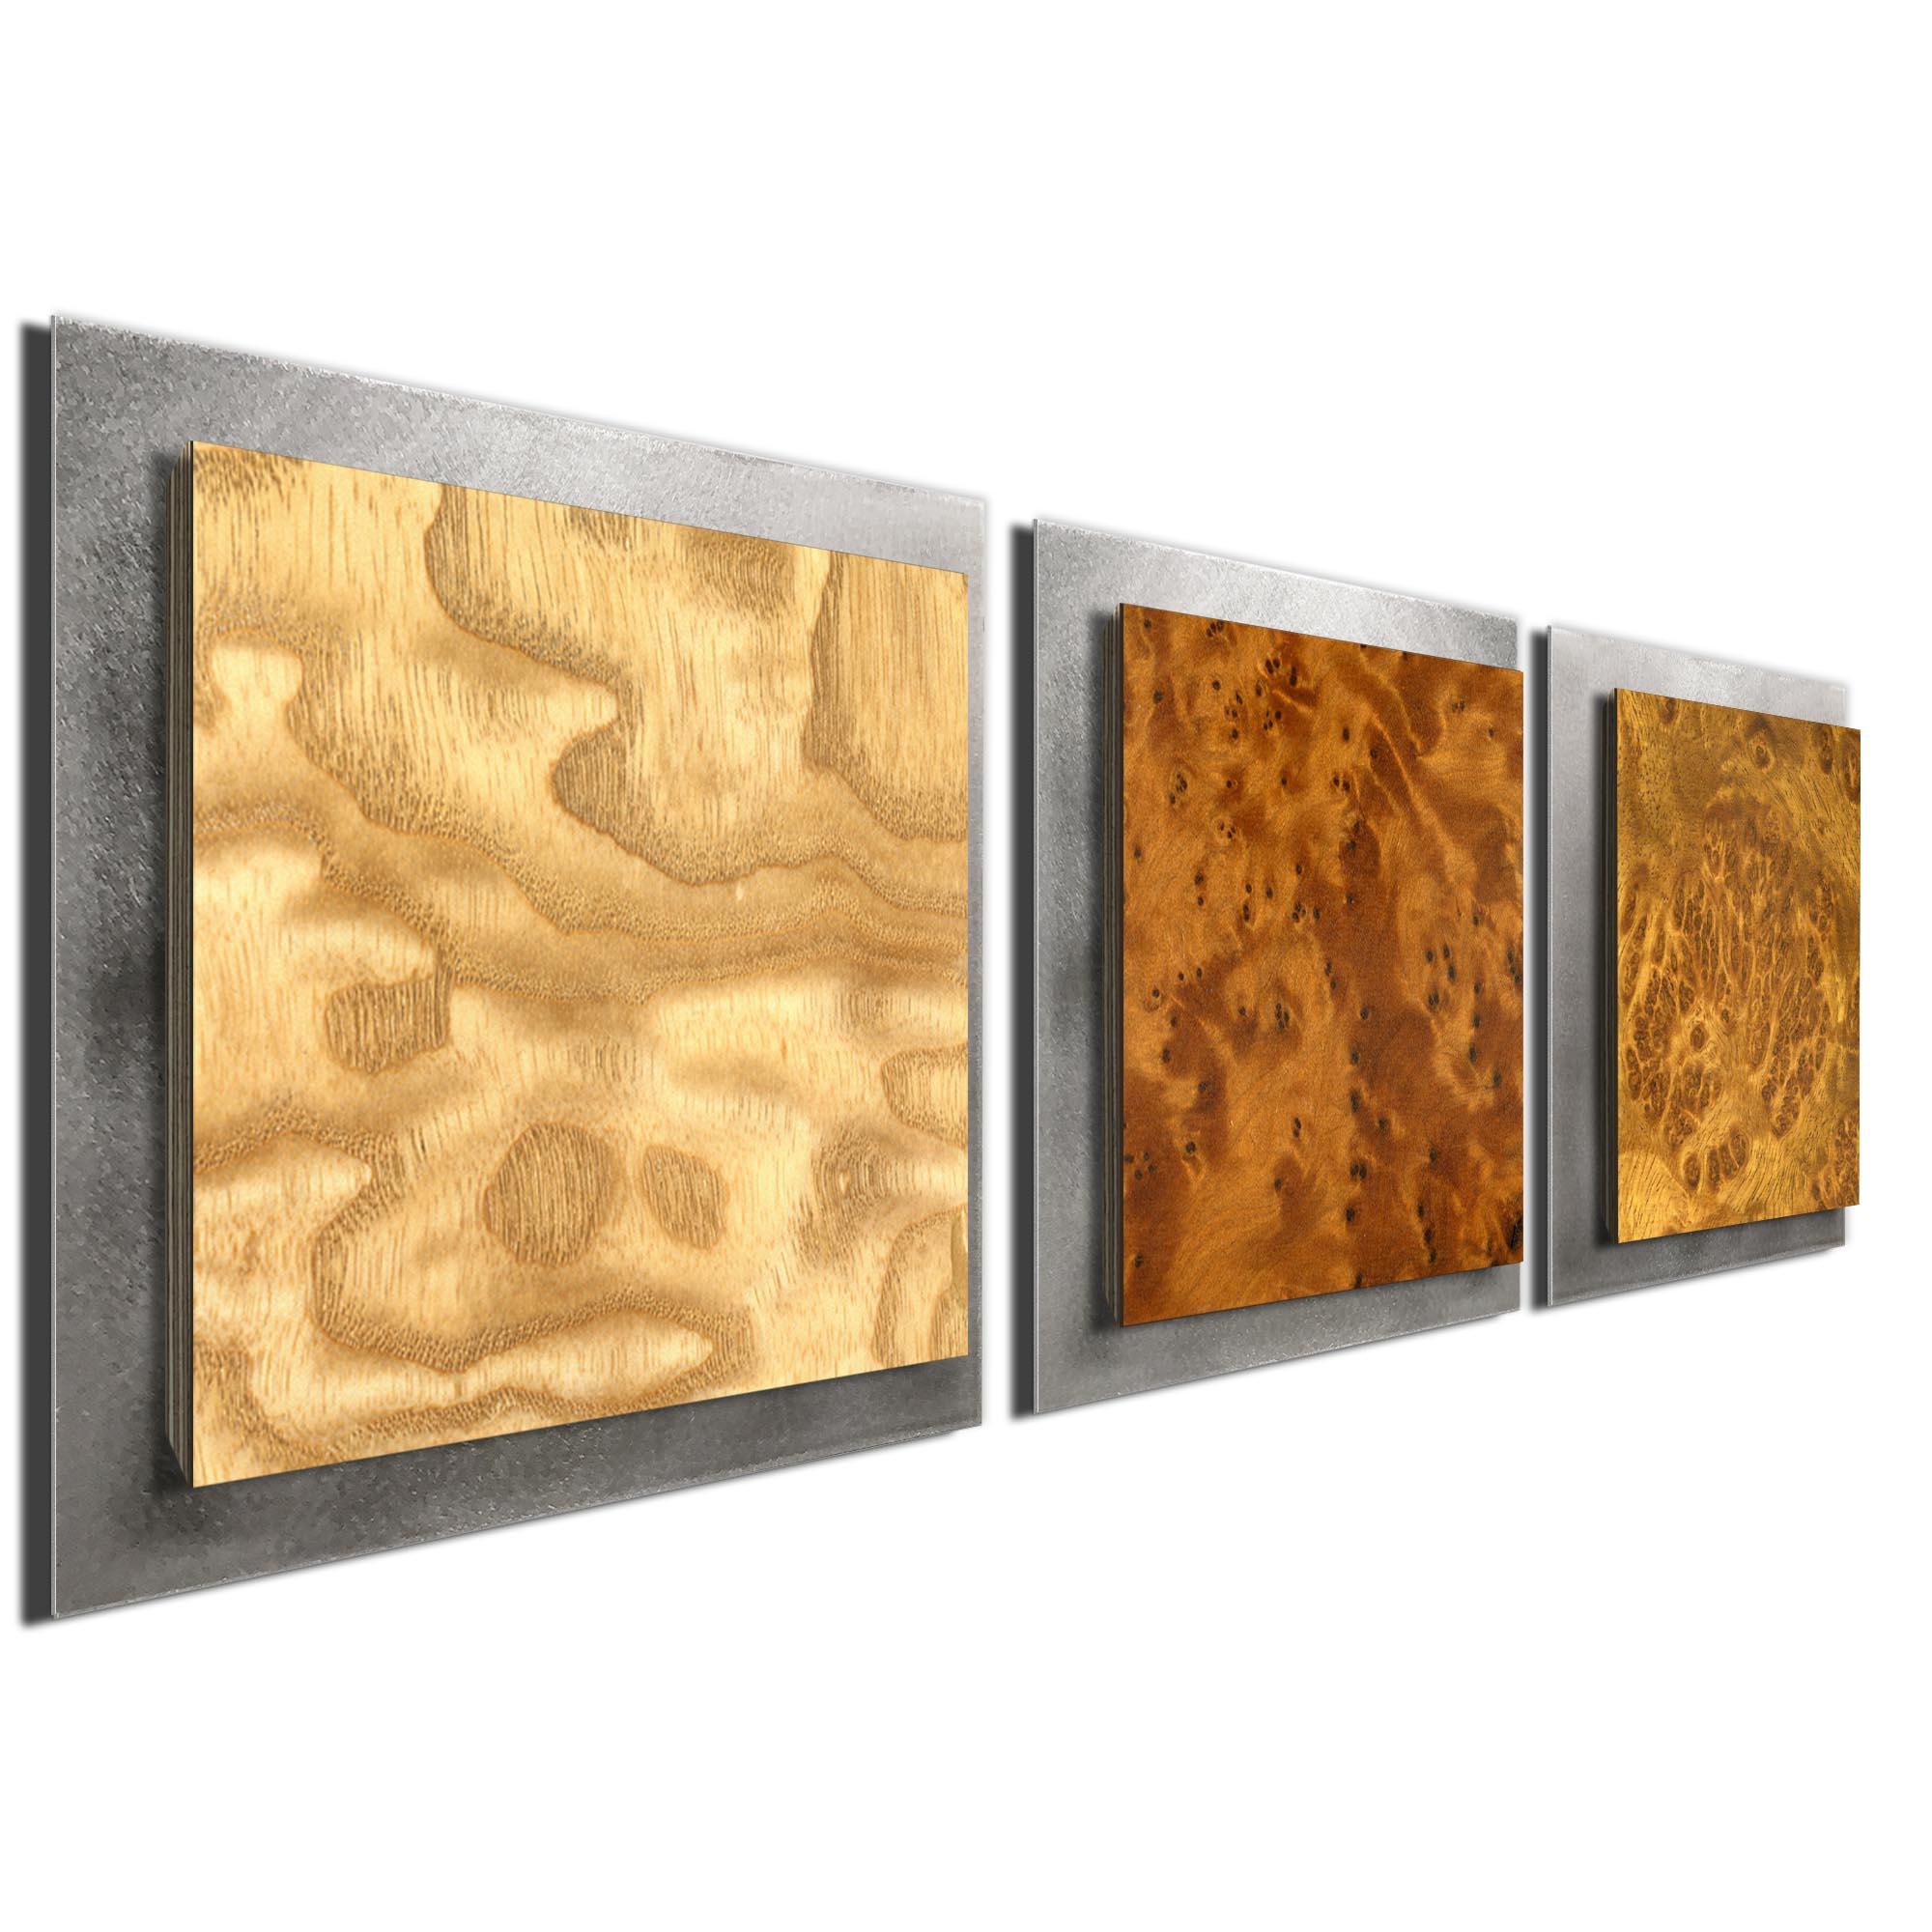 Array Burl Essence Silver by Jackson Wright Rustic Modern Style Wood Wall Art - Image 2